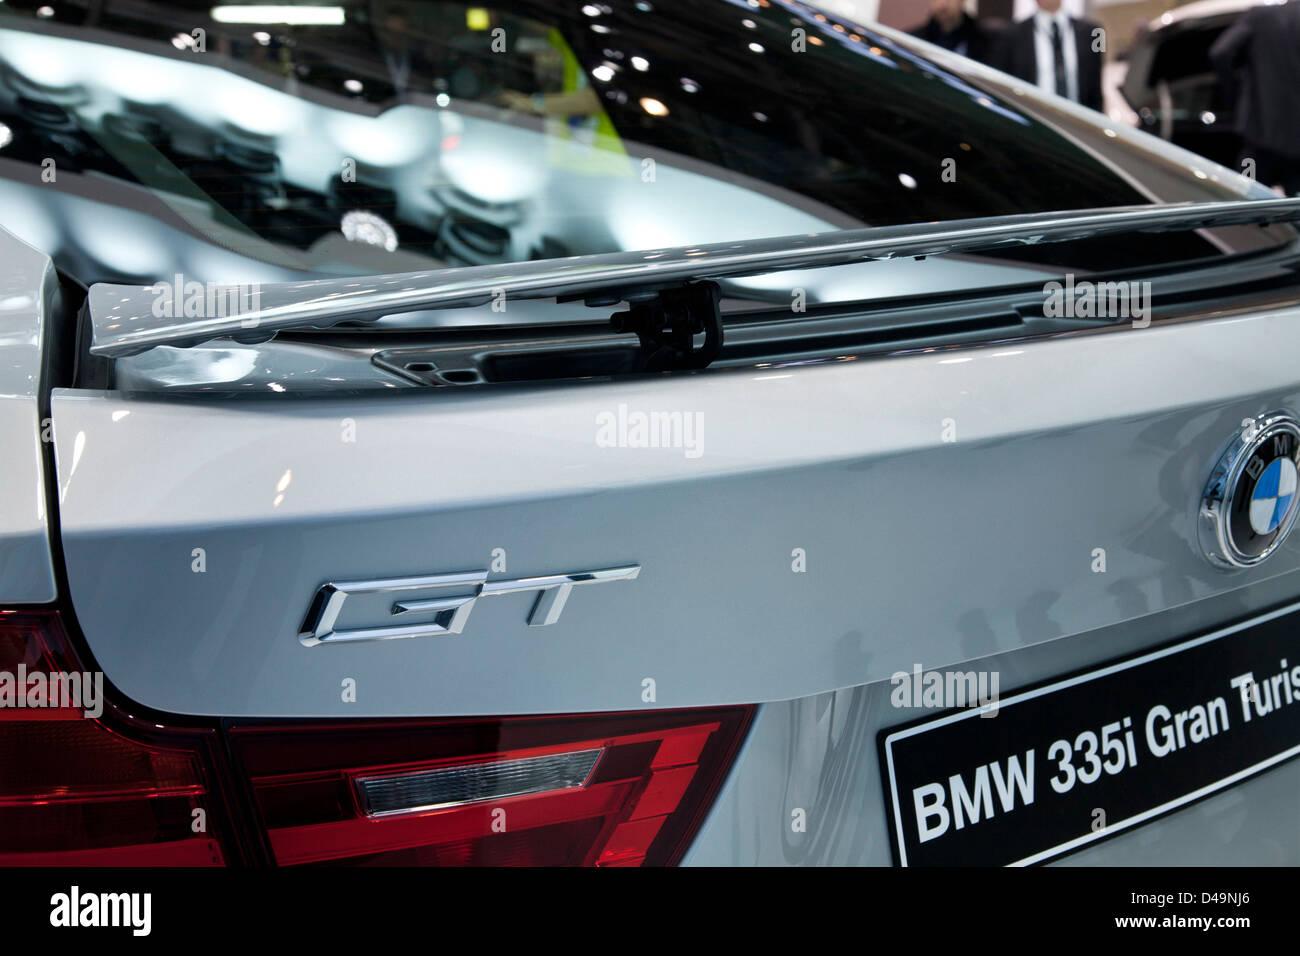 BMW 335i Gran Turismo. Geneva Motor Show 2013 - Stock Image